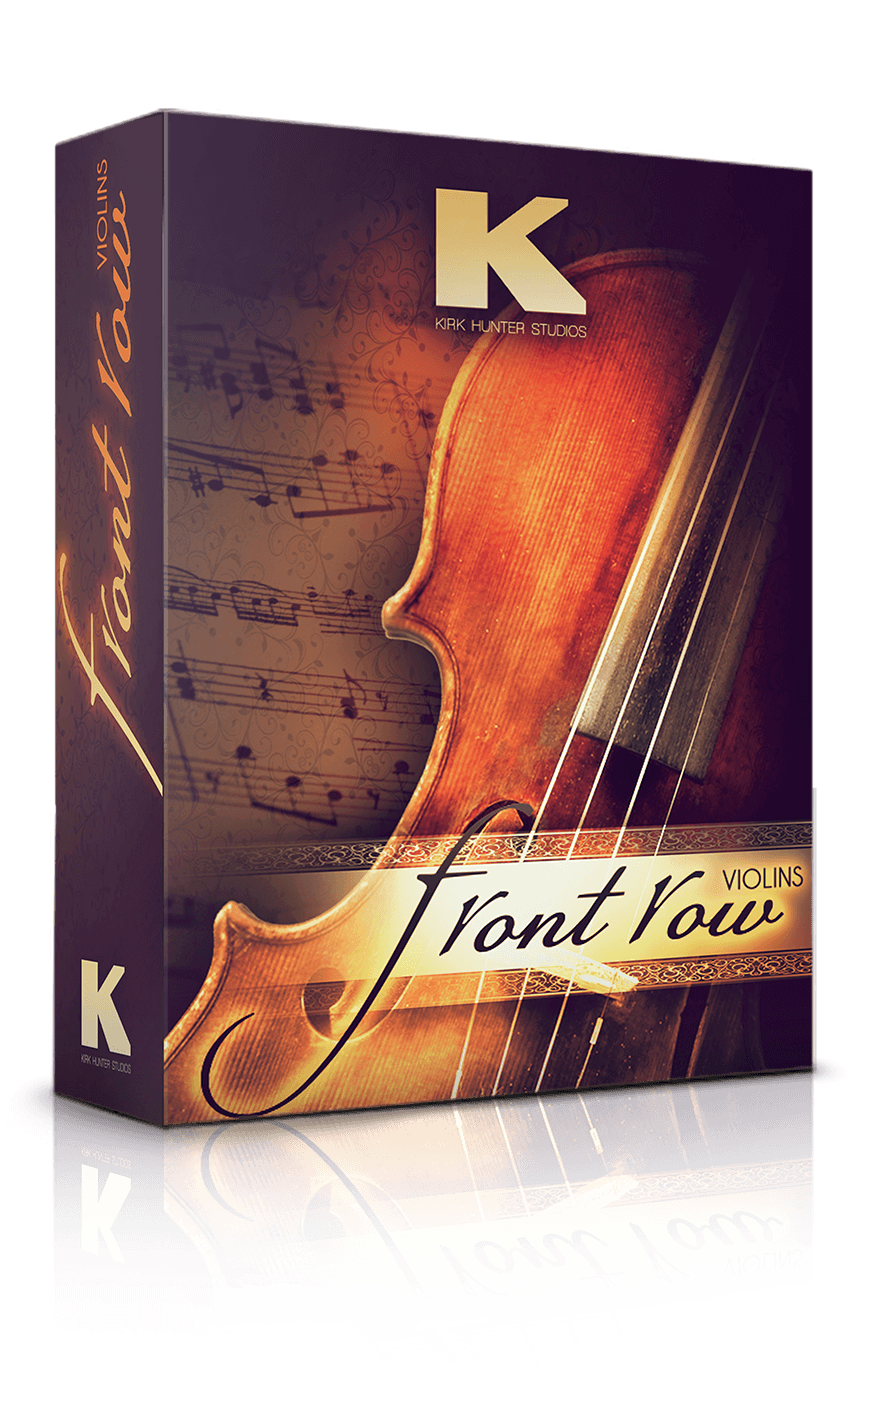 Kirk Hunter Studios | WELCOME TO THE ALL-NEW KIRK HUNTER STUDIOS